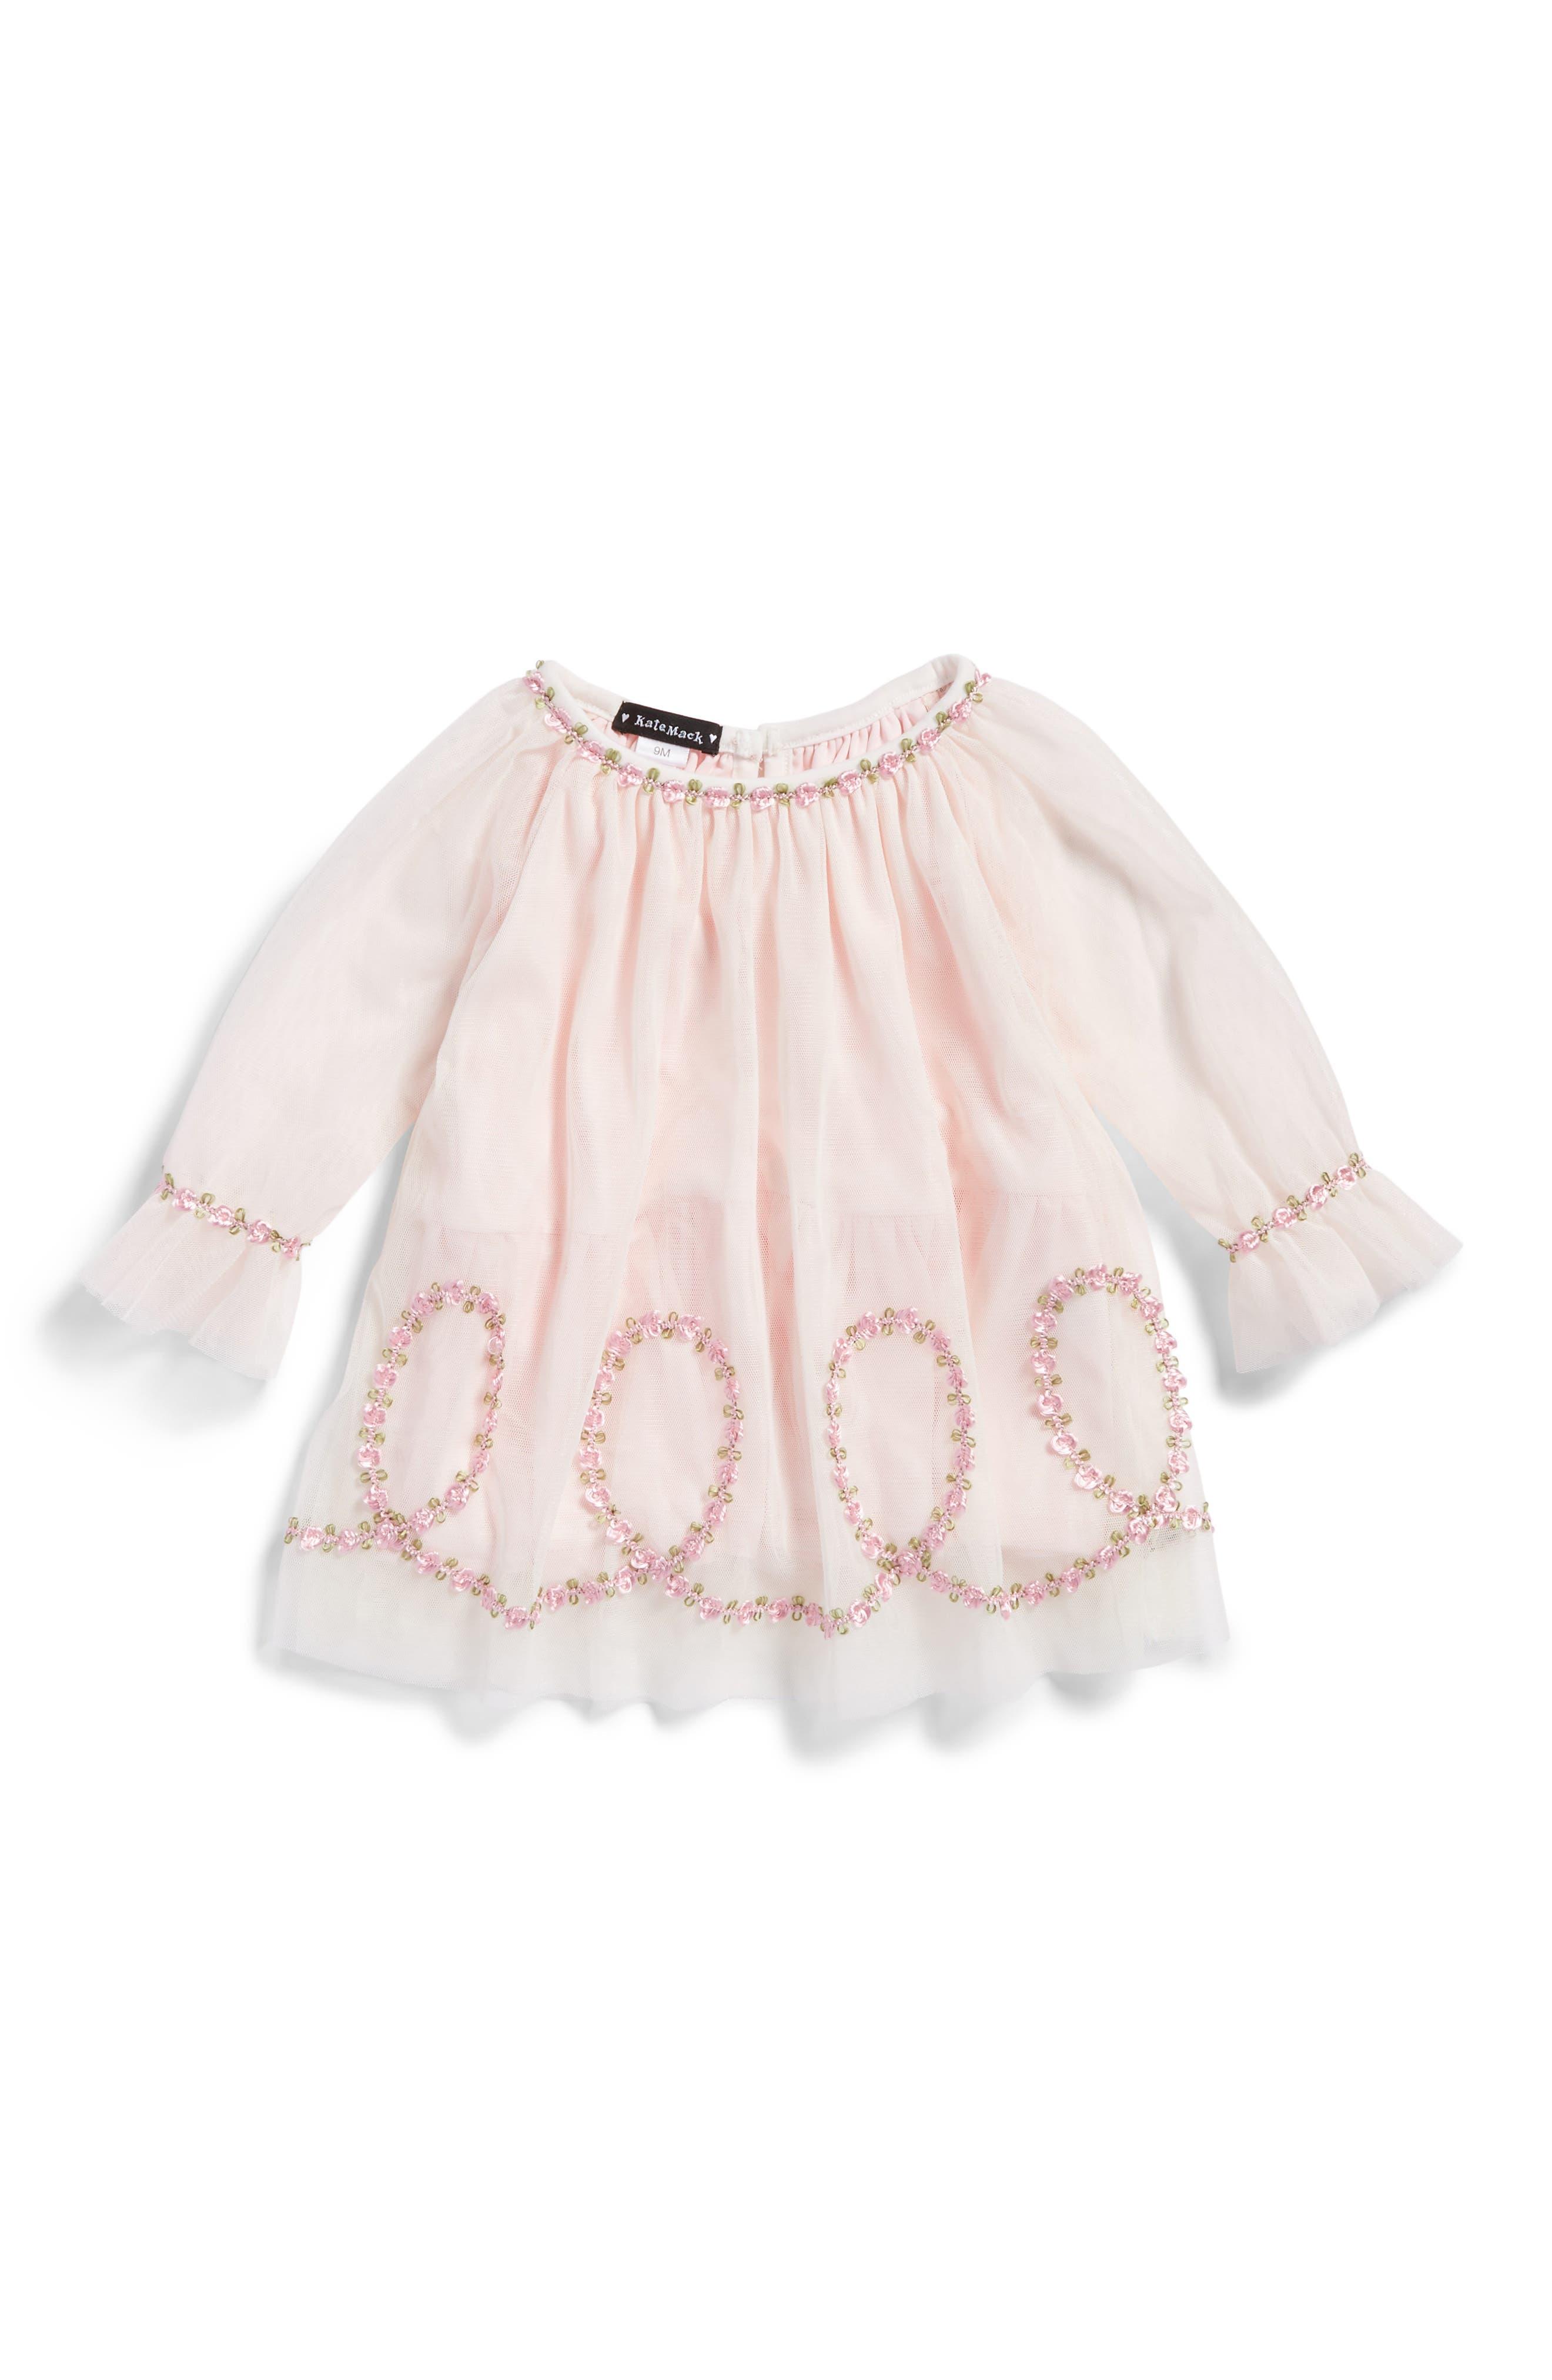 Embroidered Mesh Dress,                             Main thumbnail 1, color,                             650